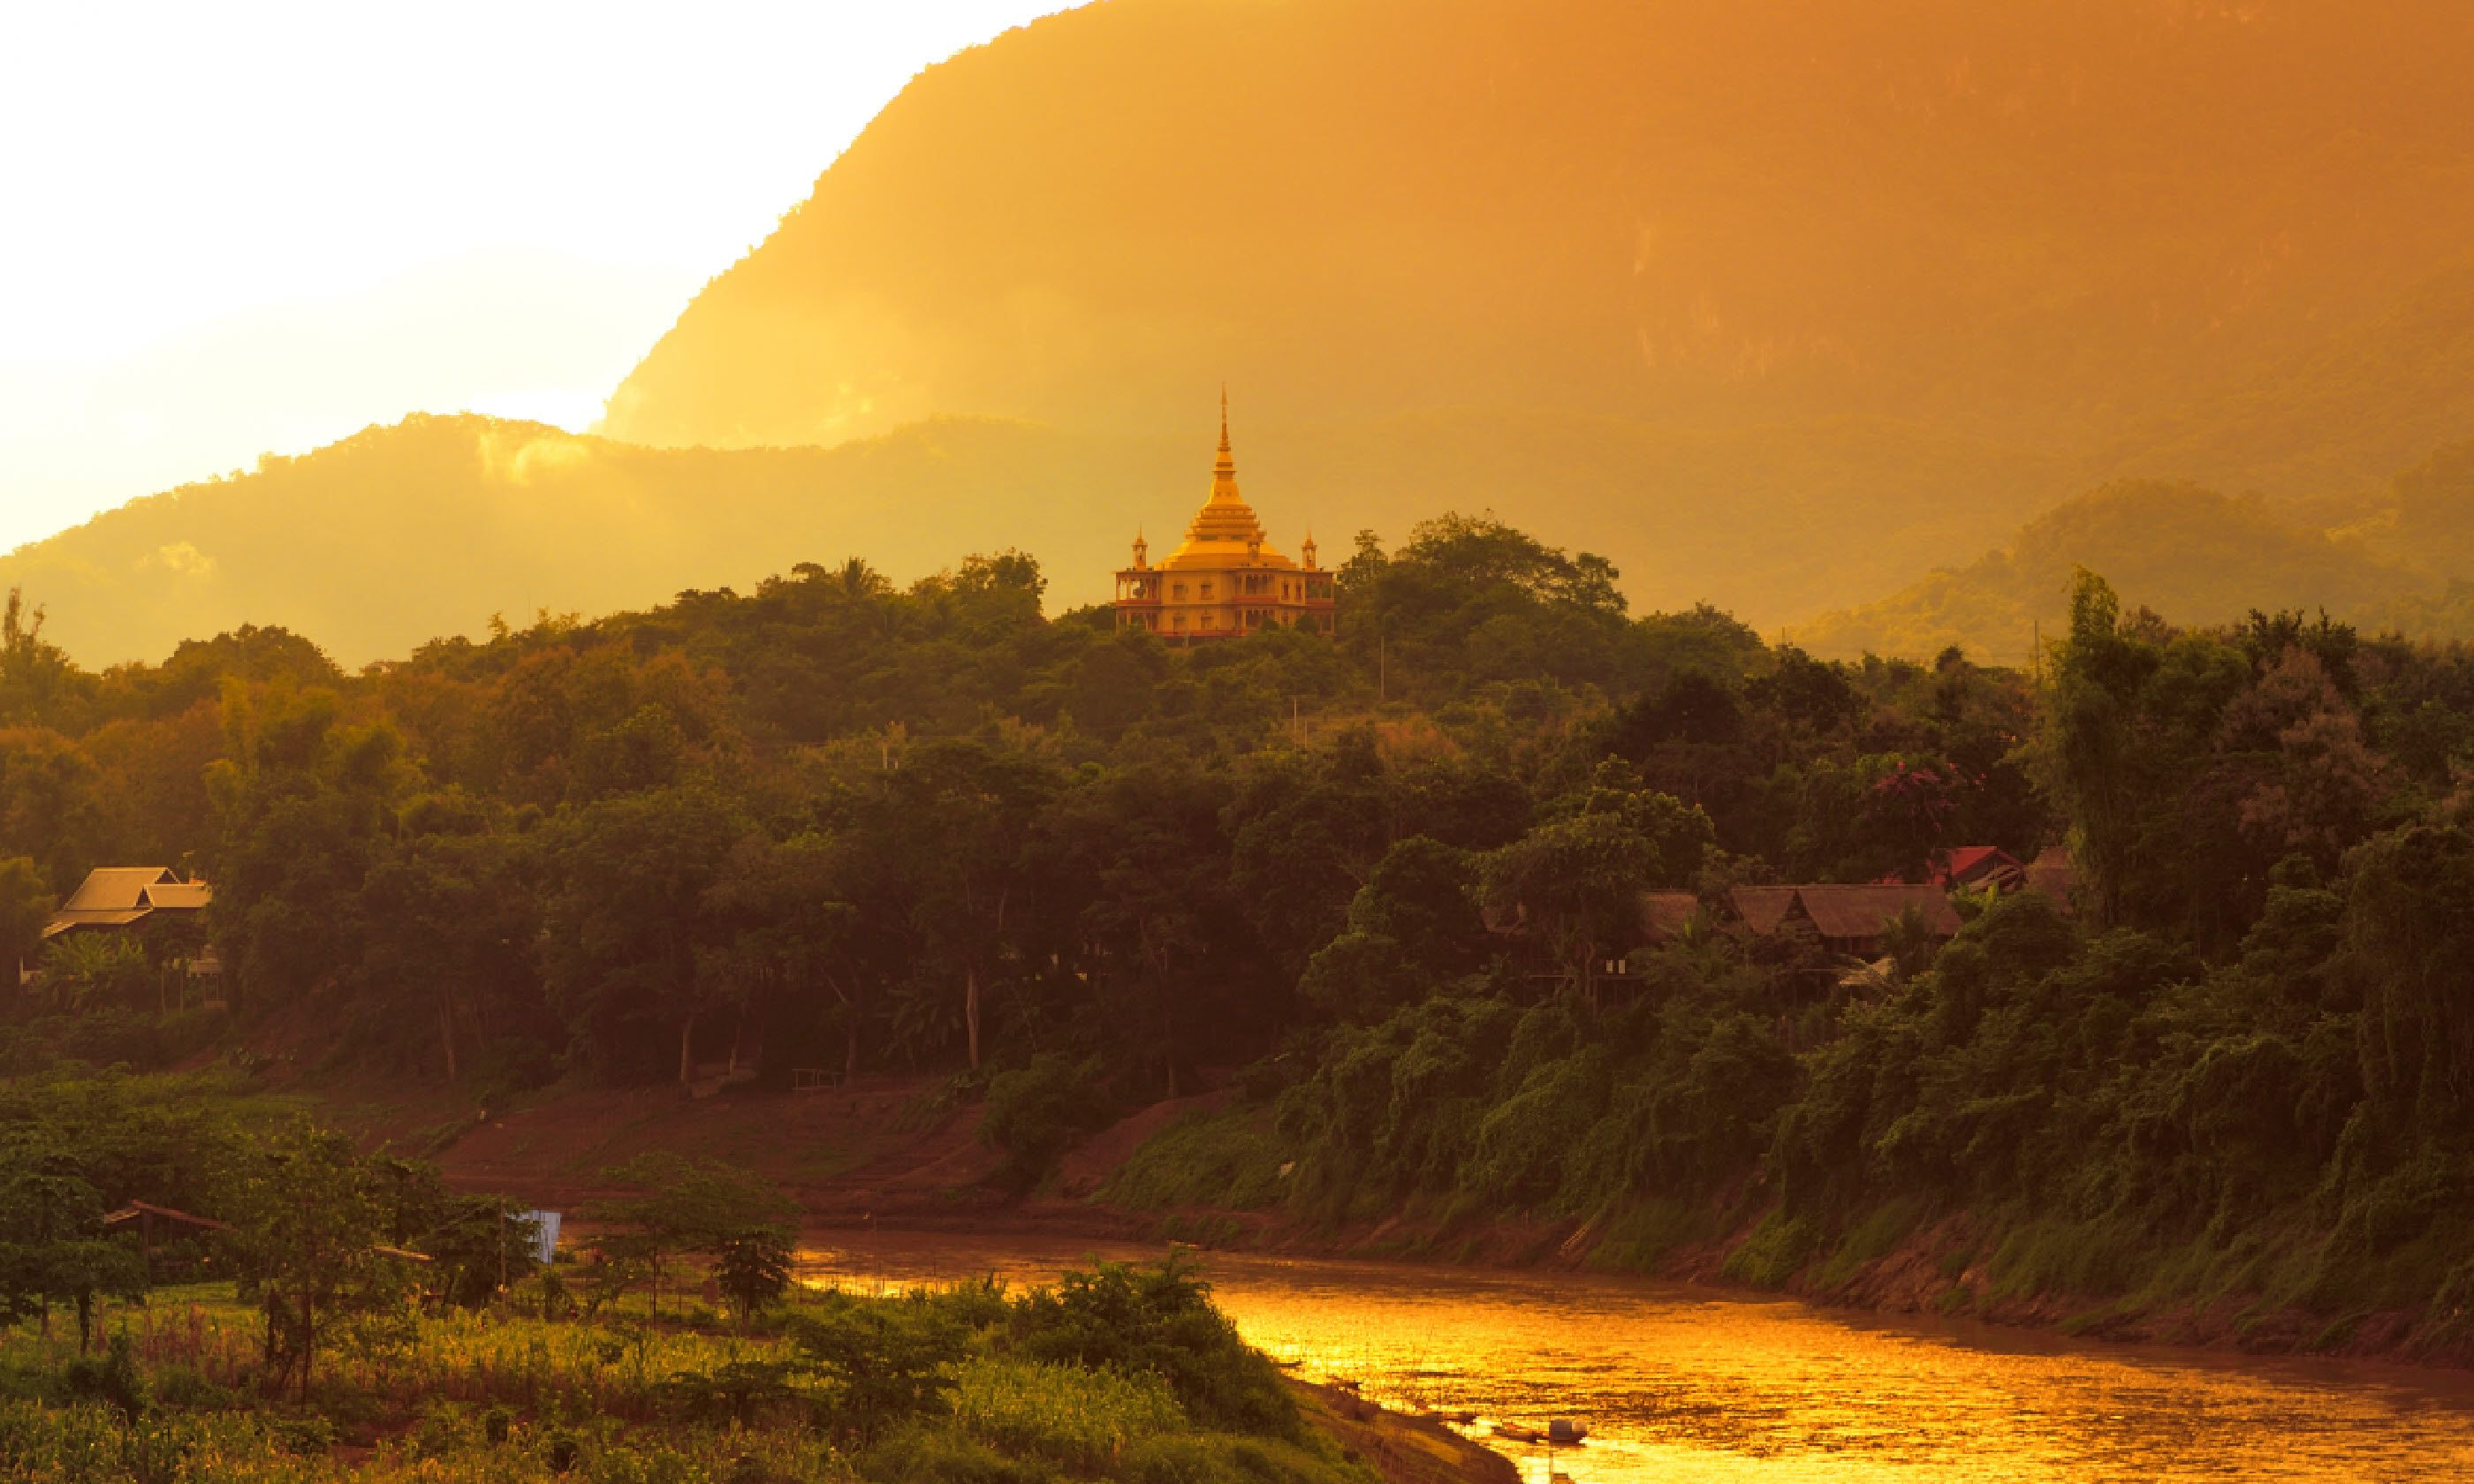 Luang Prabang, Laos (Shutterstock)